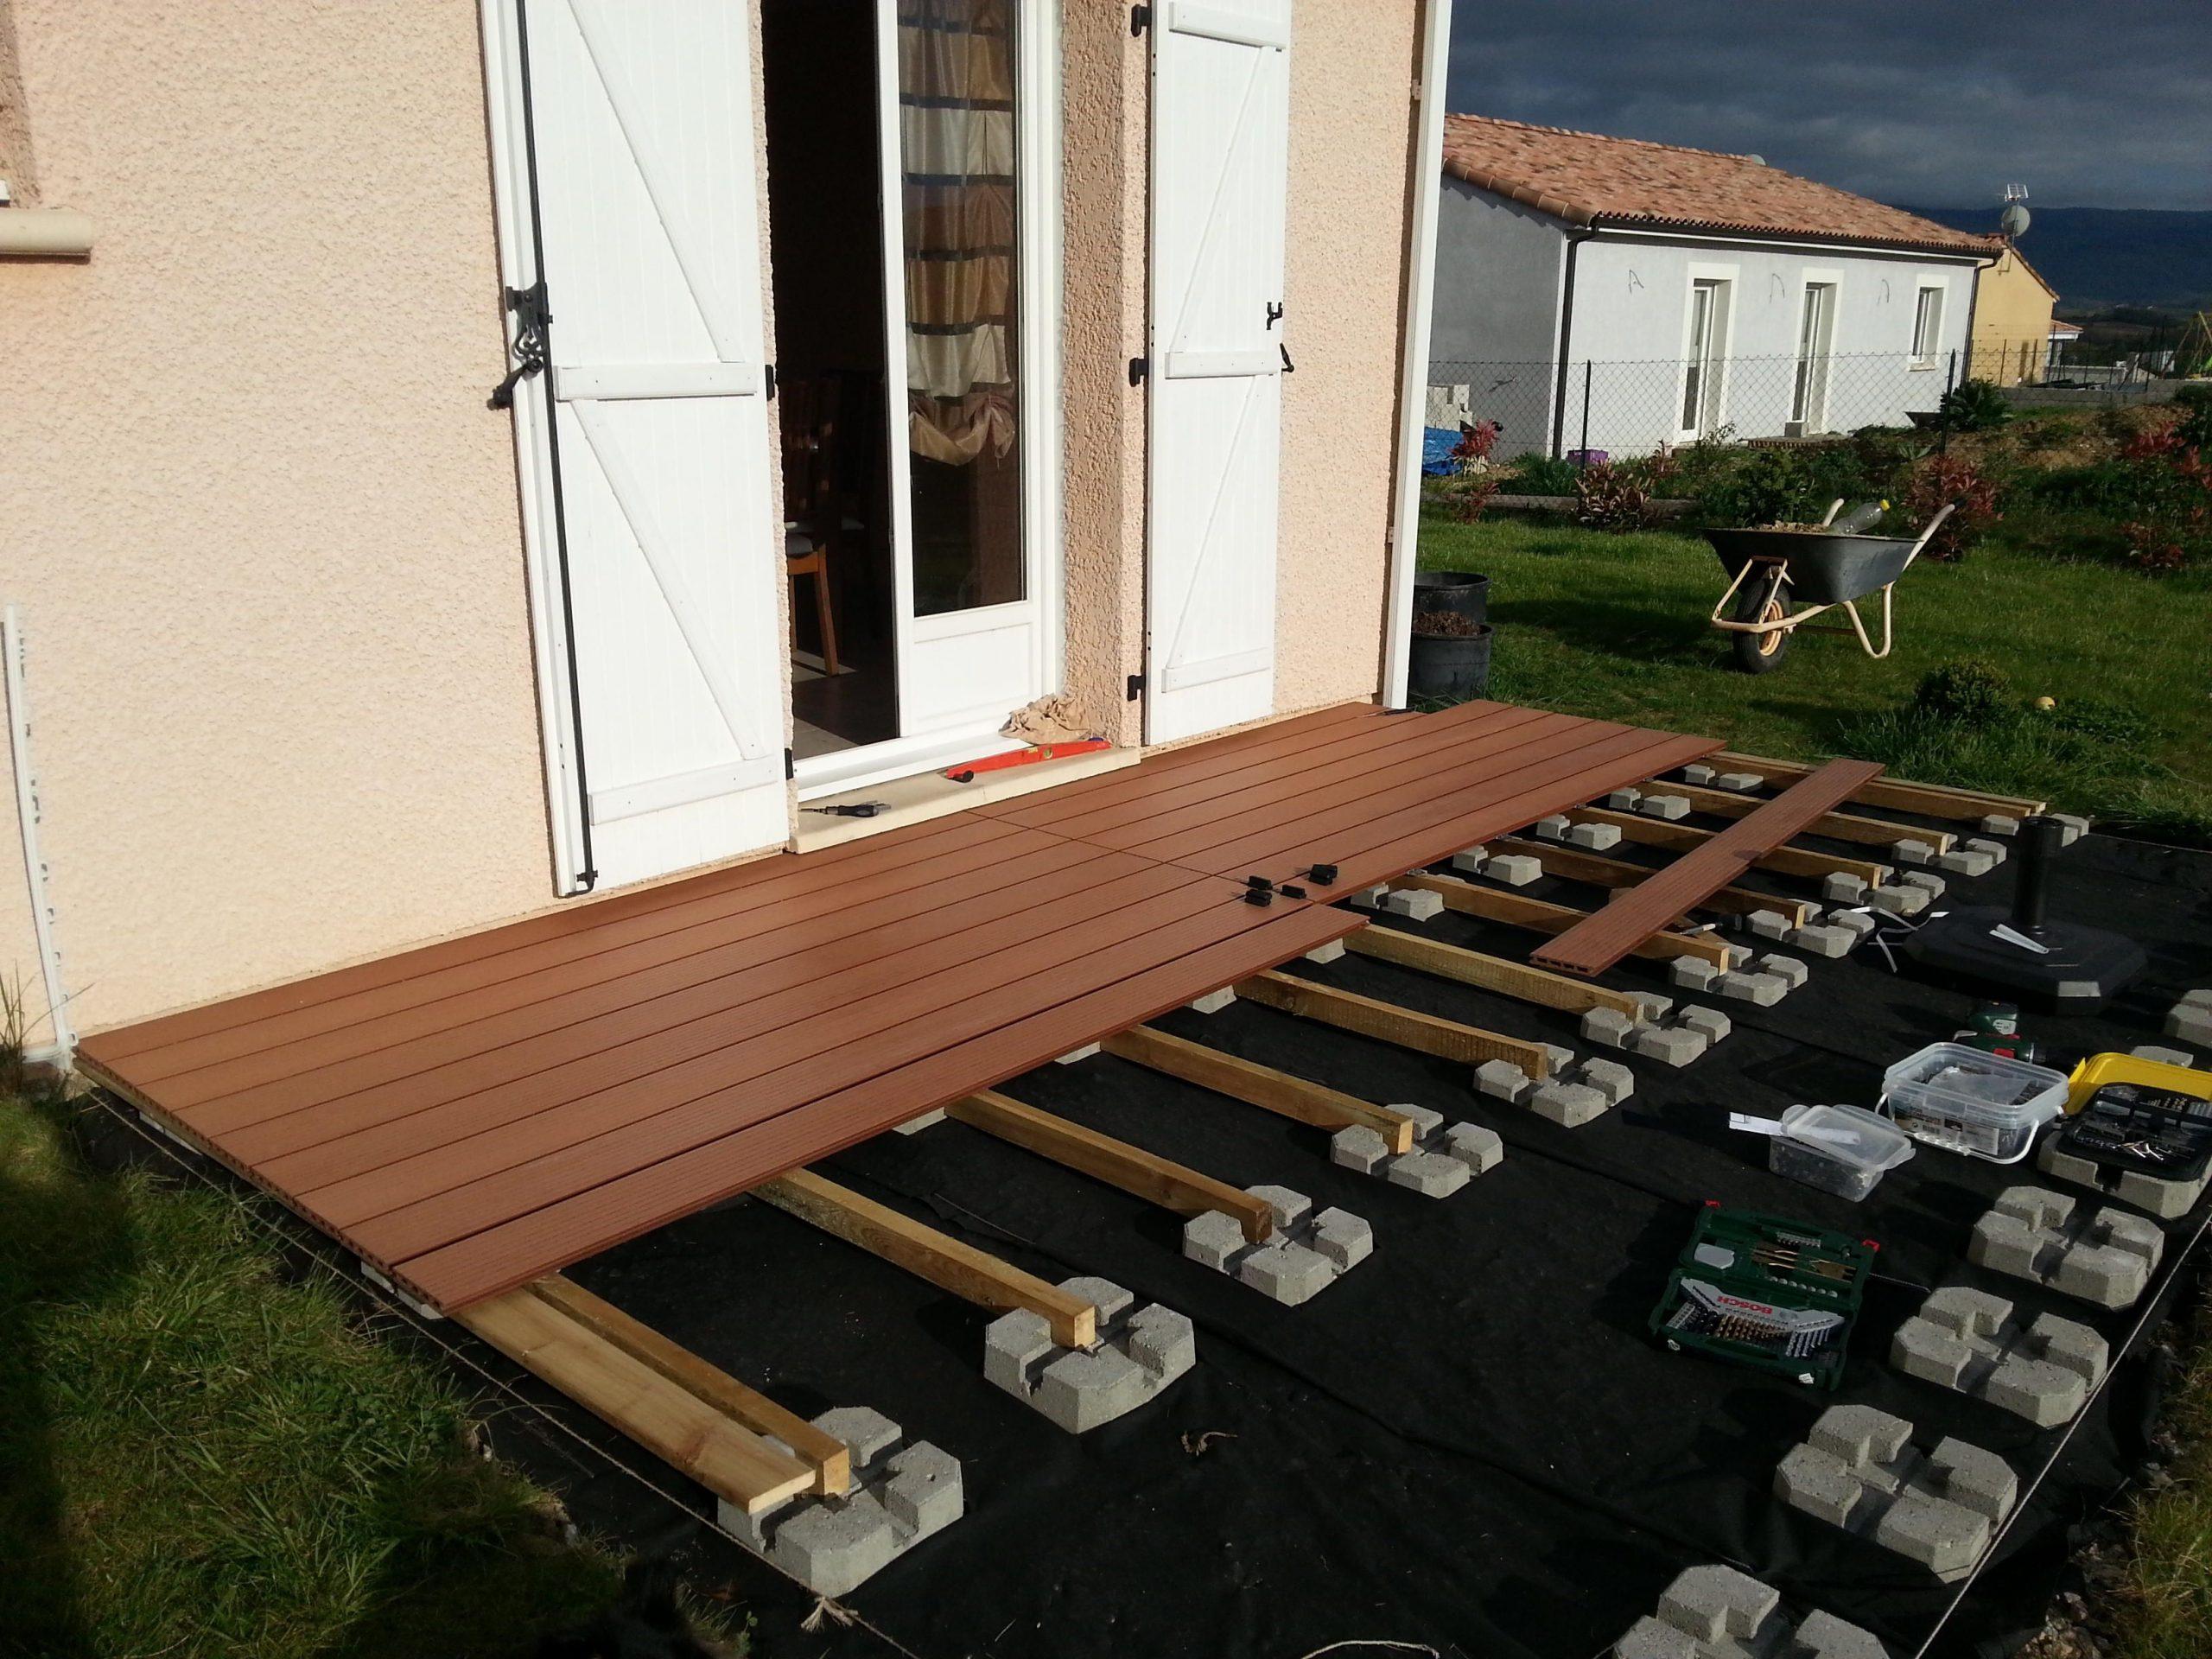 Pose Terrasse Lame Composite Sur Plot Beton   Terrasse ... pour Baguette Finition Terrasse Sur Plot